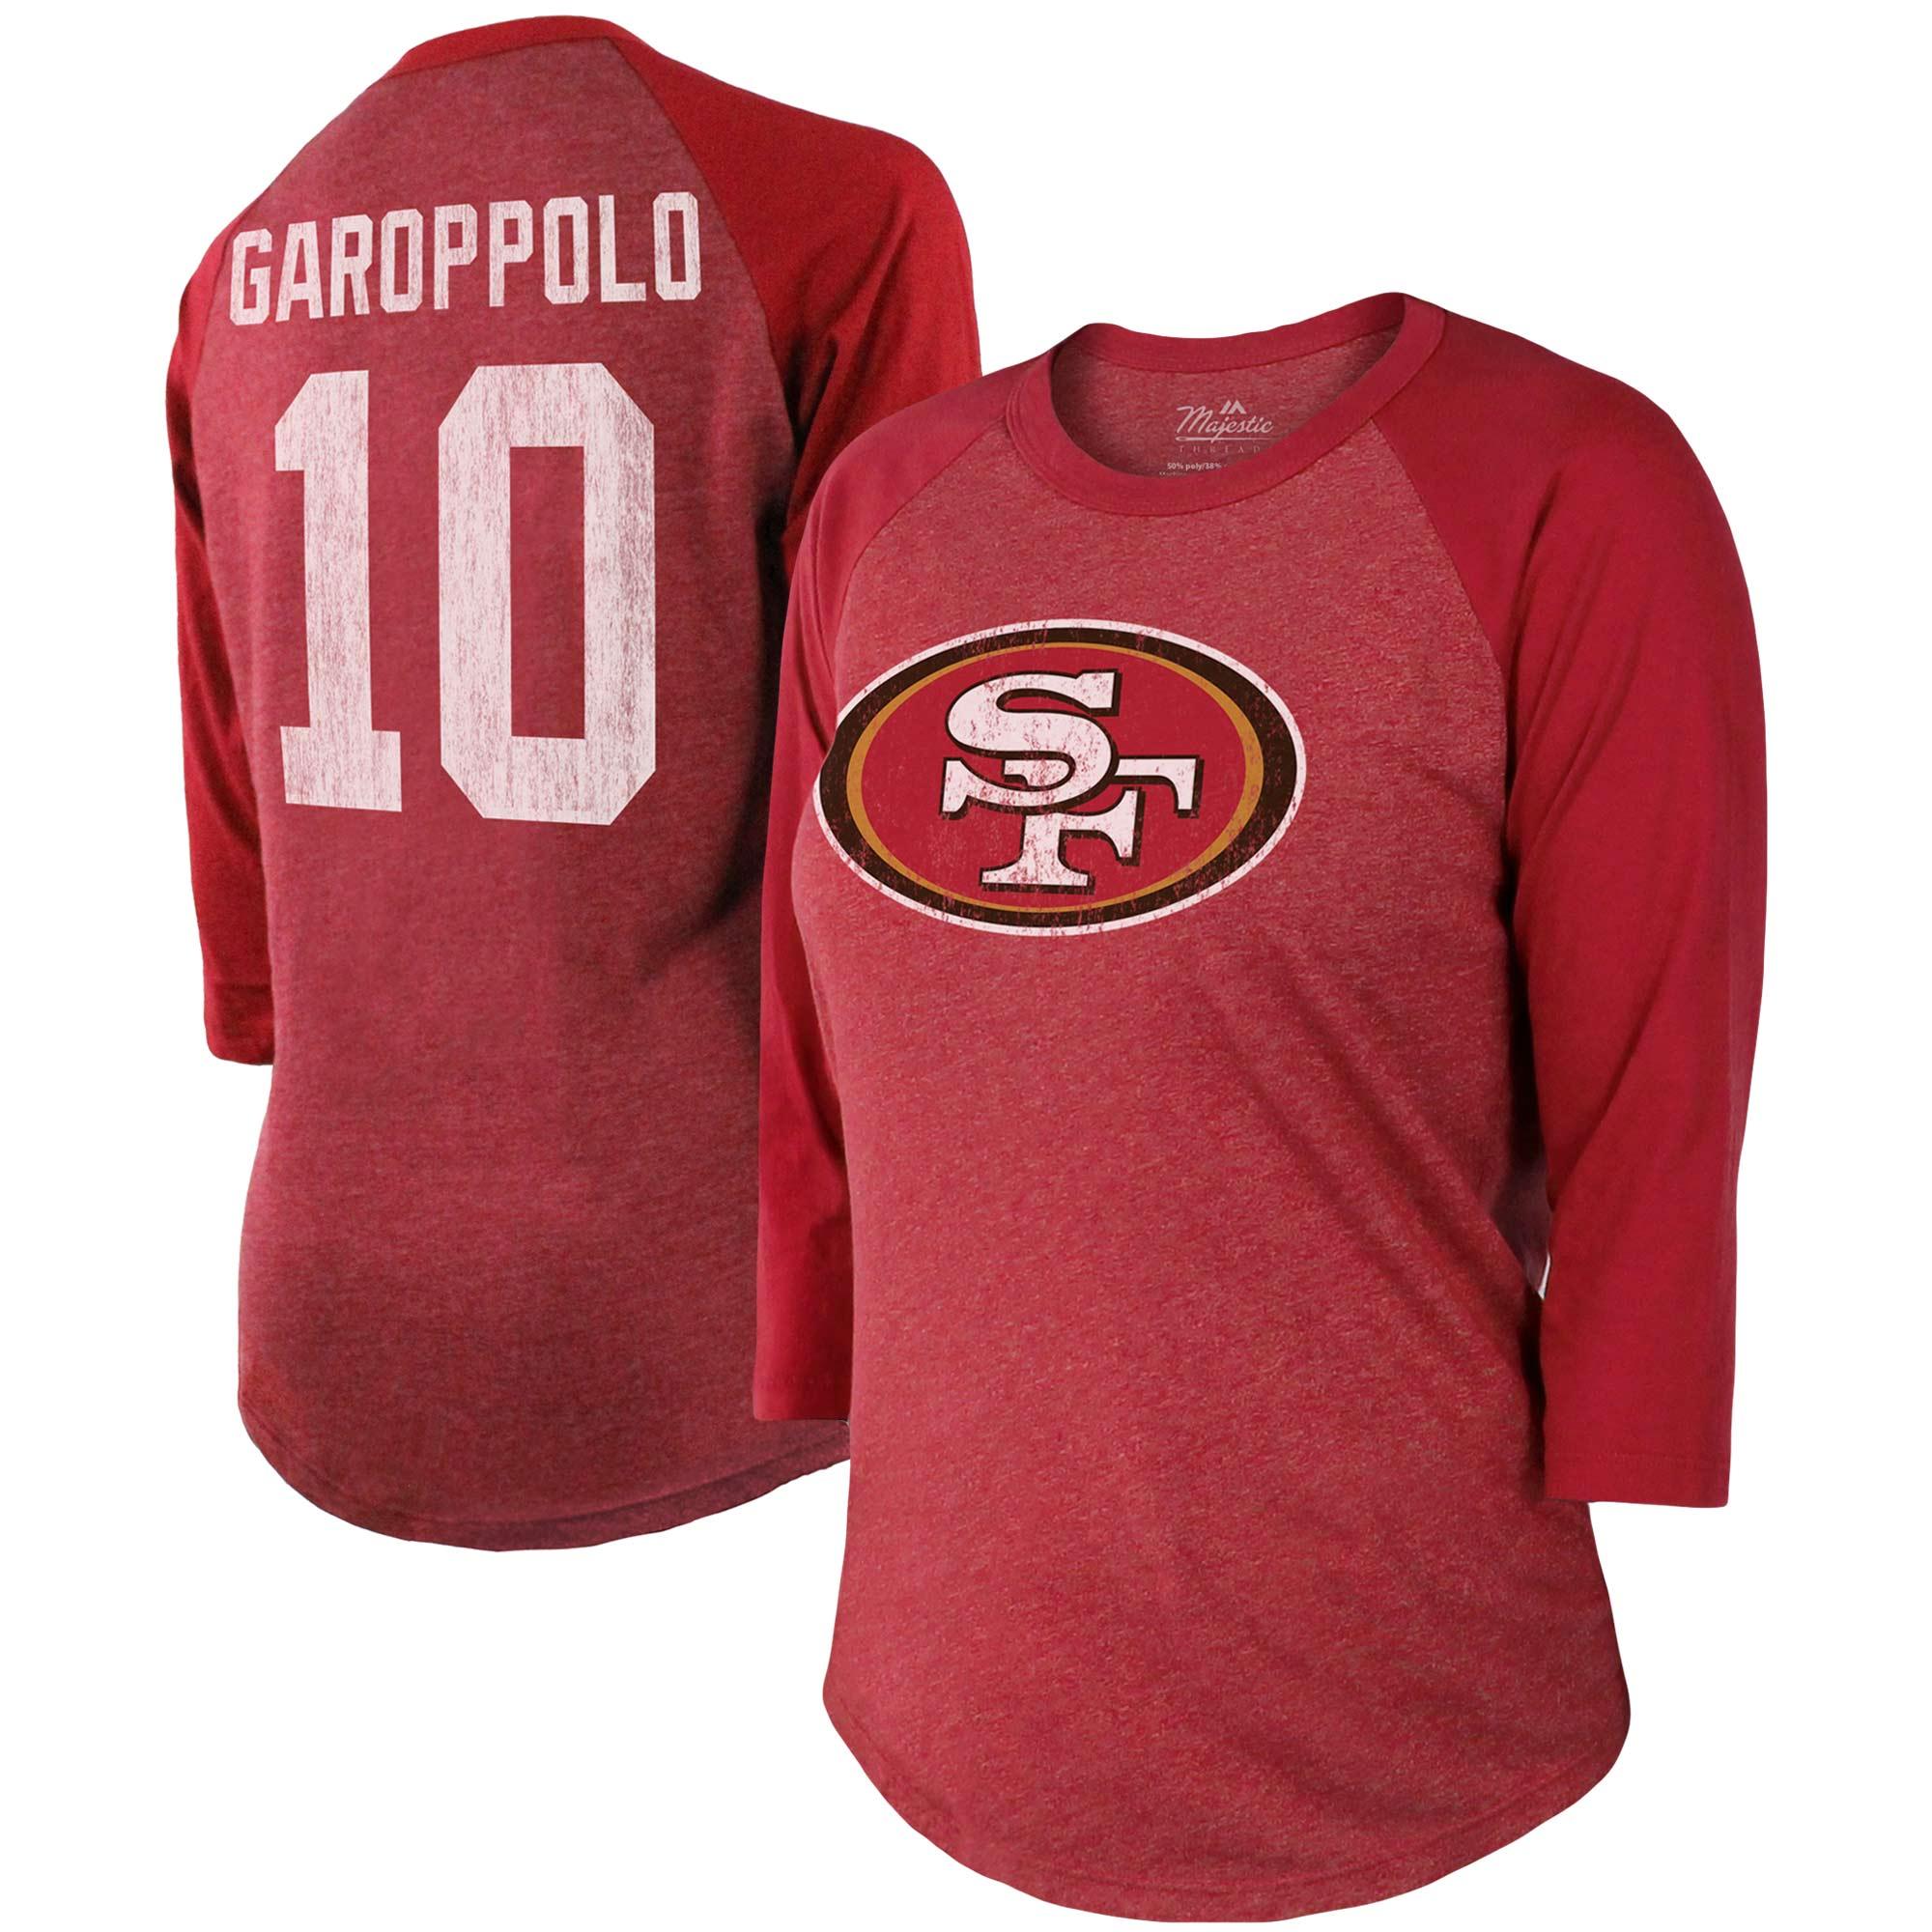 Jimmy Garoppolo San Francisco 49ers Majestic Women's Player Name & Number Tri-Blend 3/4-Sleeve Raglan Sleeves - Scarlet